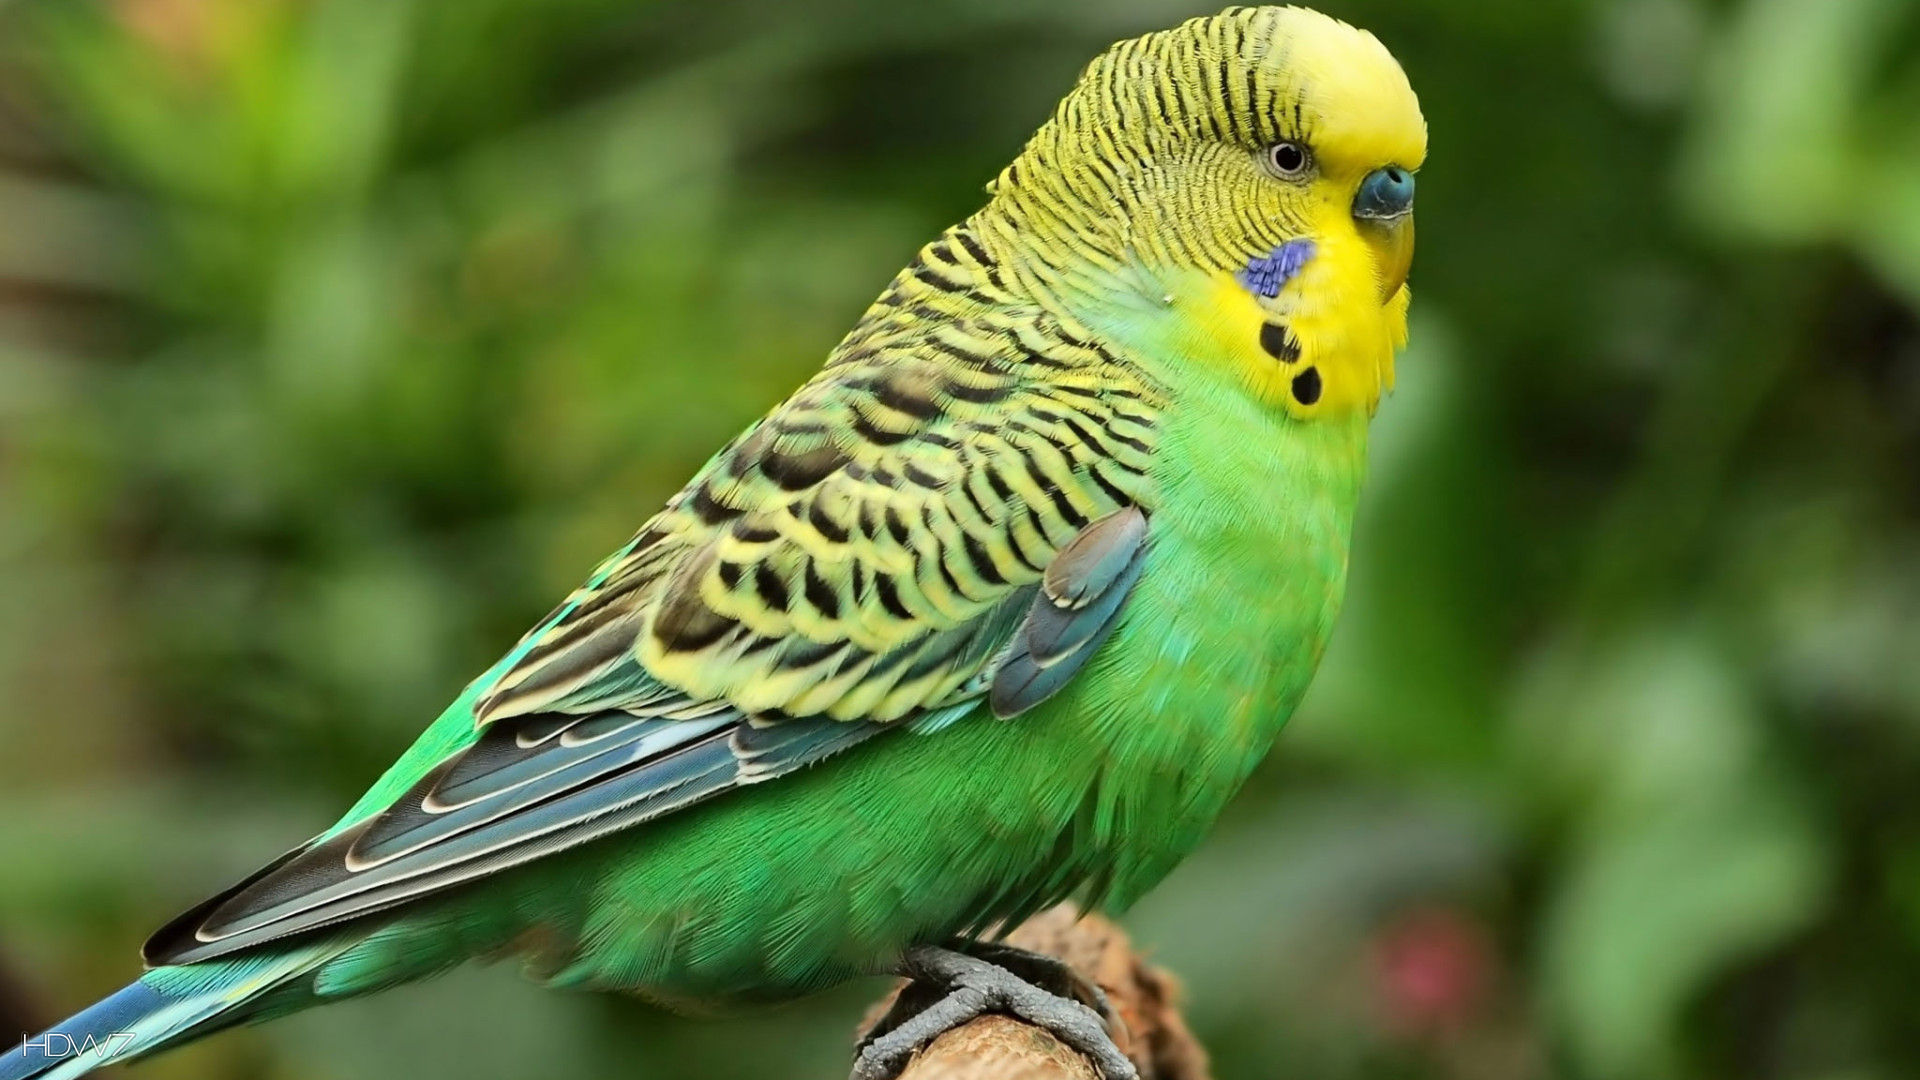 budgie-melopsittacus-undulatus-bird-nice-green